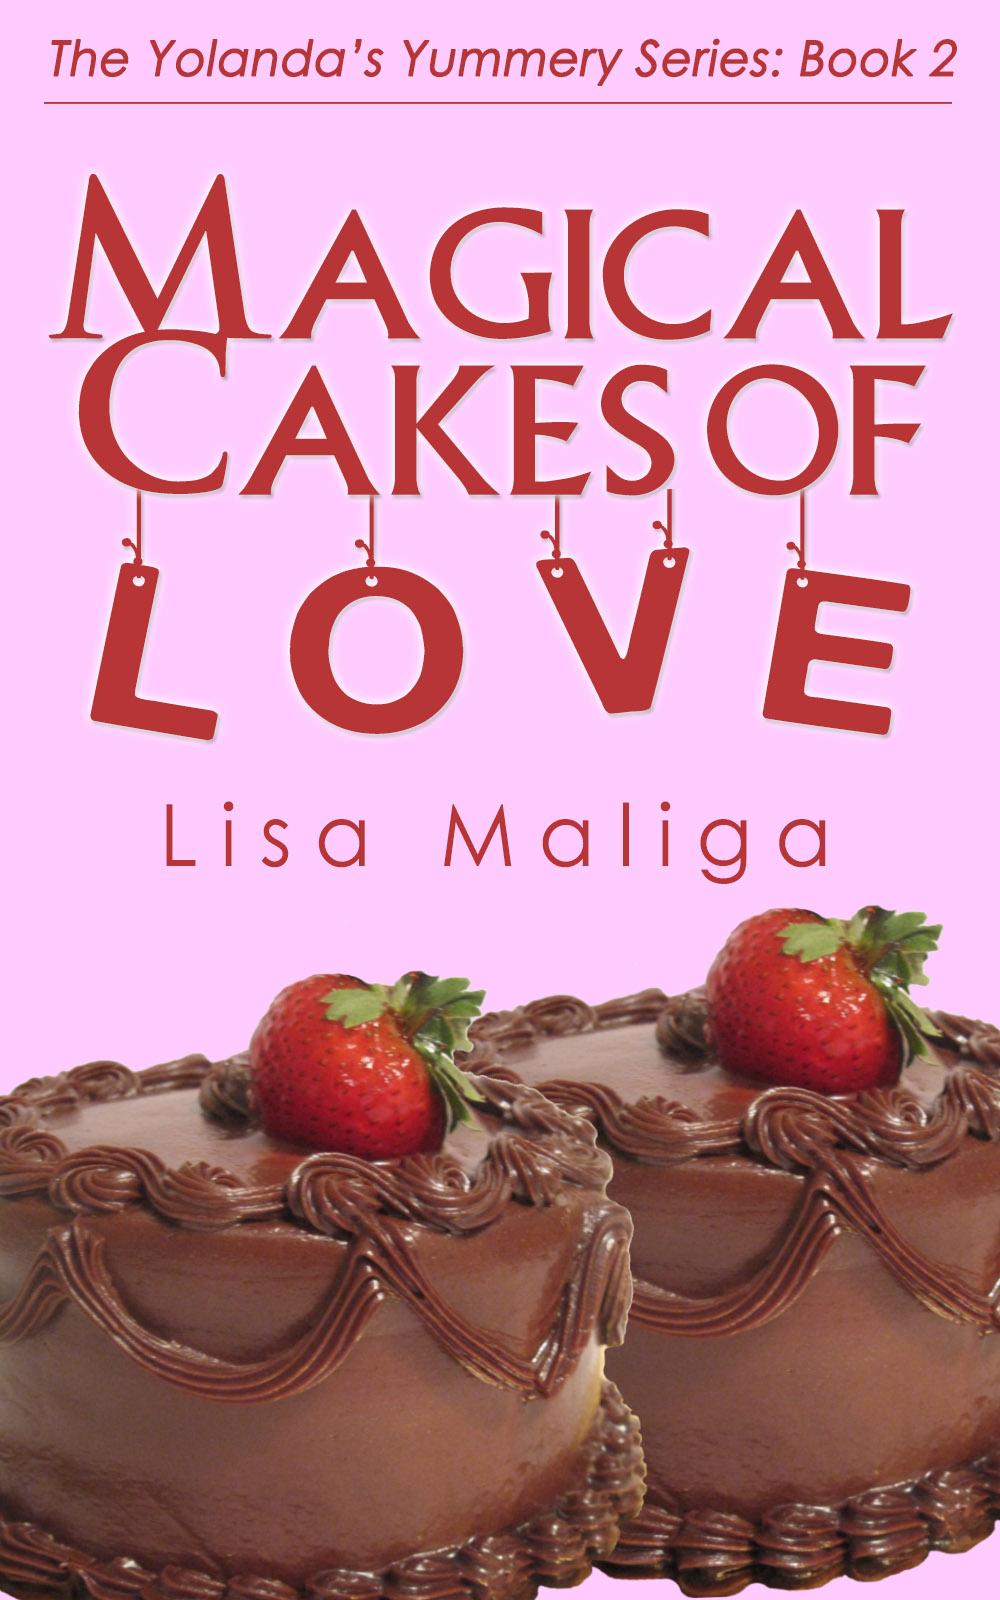 magical cakes of love yolanda's yummery series book 2 lisa maliga